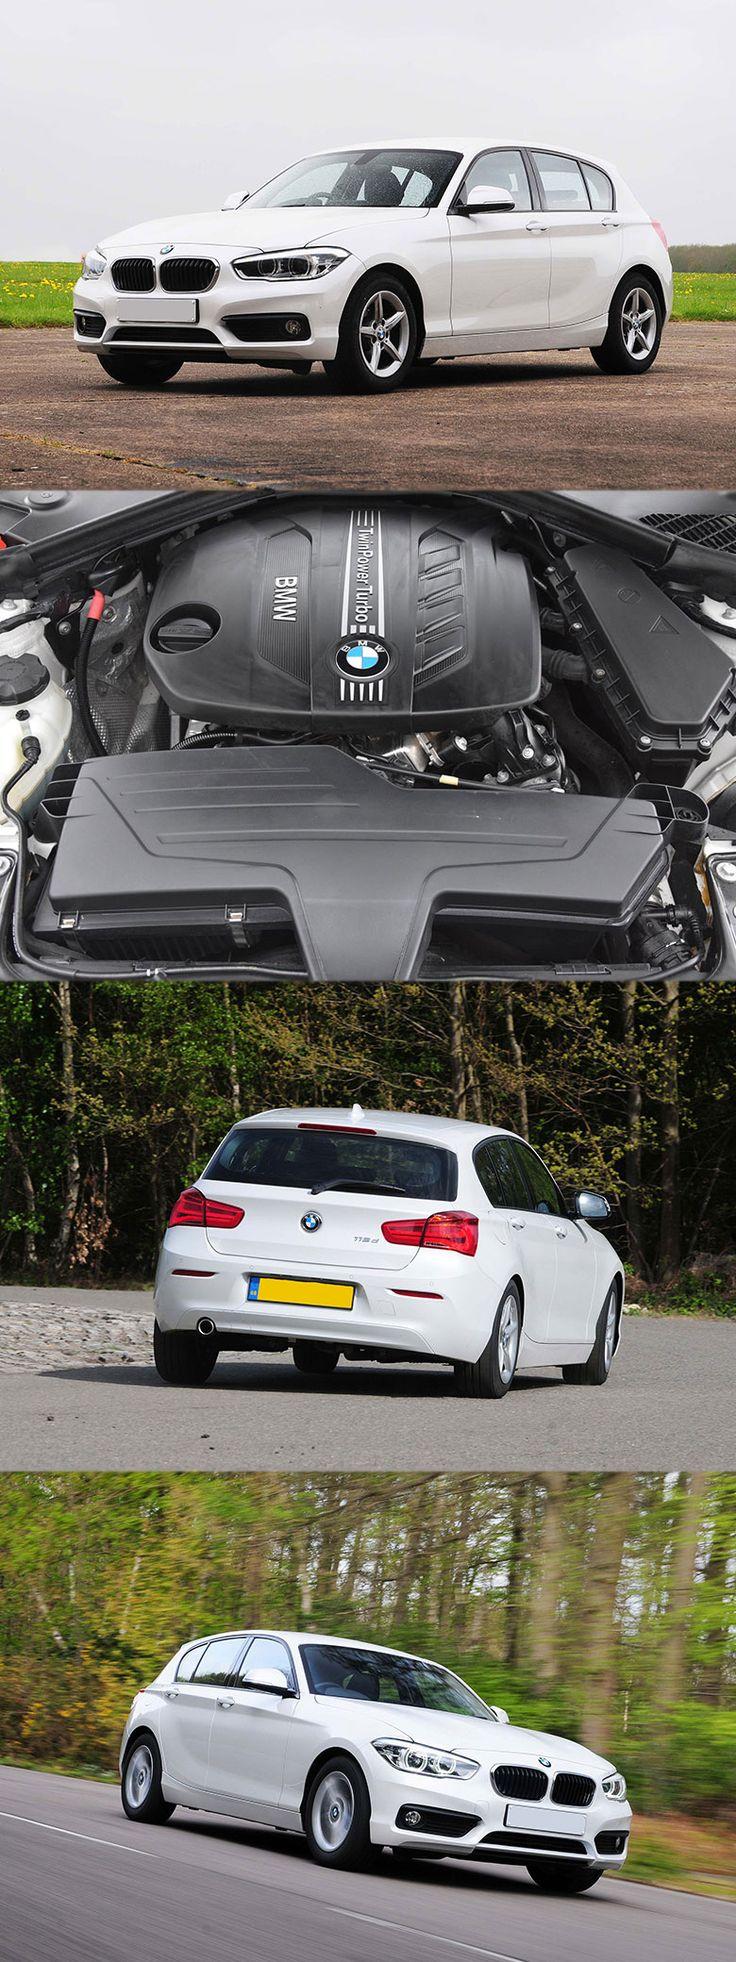 BMW 118d, A Splendid Compact Hatchback https://www.enginetrust.co.uk/blog/category/bmw/